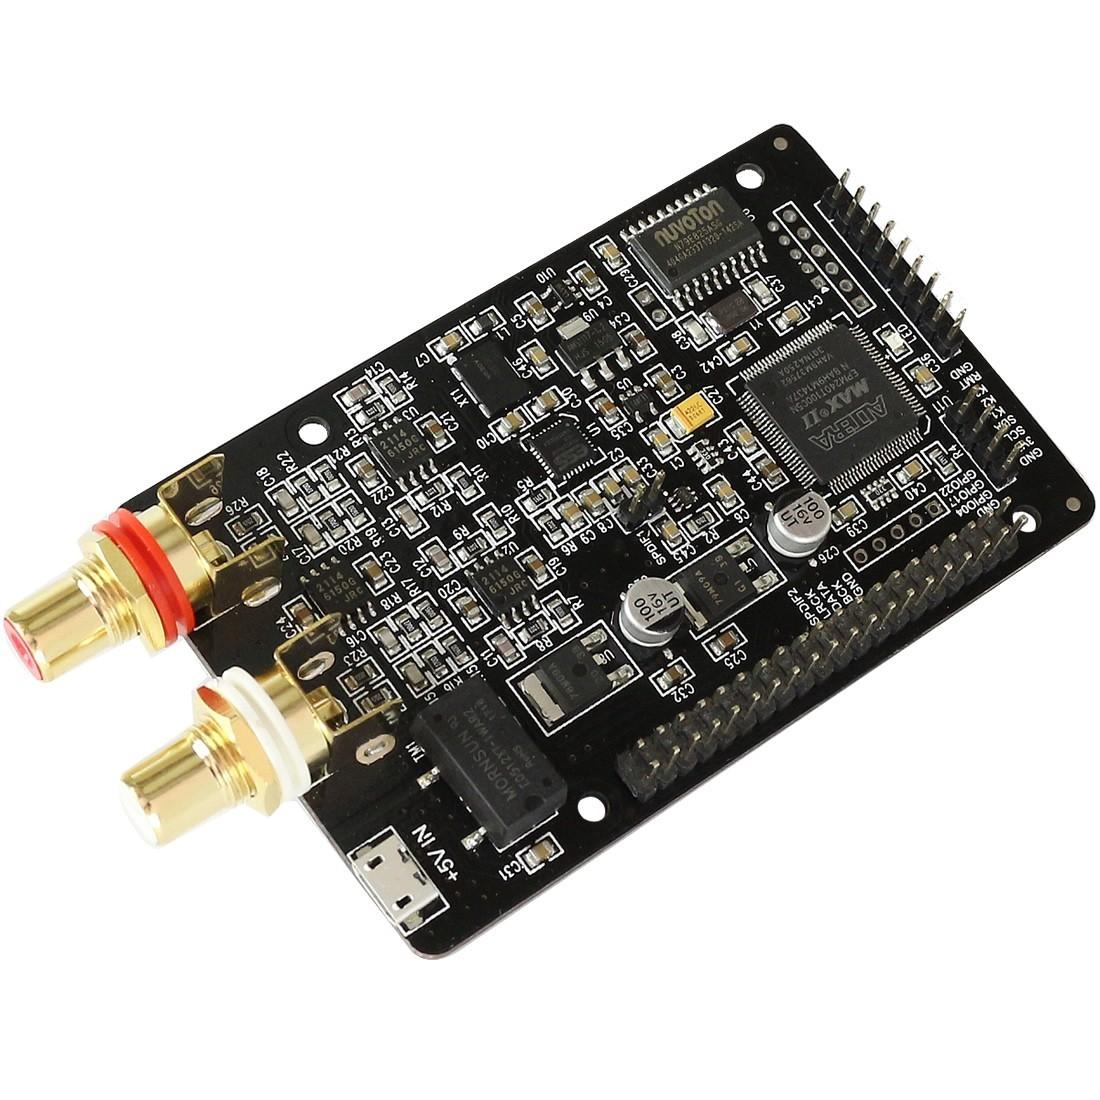 AUDIOPHONICS I-Sabre DAC ES9028Q2M KALI EDITION Raspberry Pi 3 / 2 / I2S